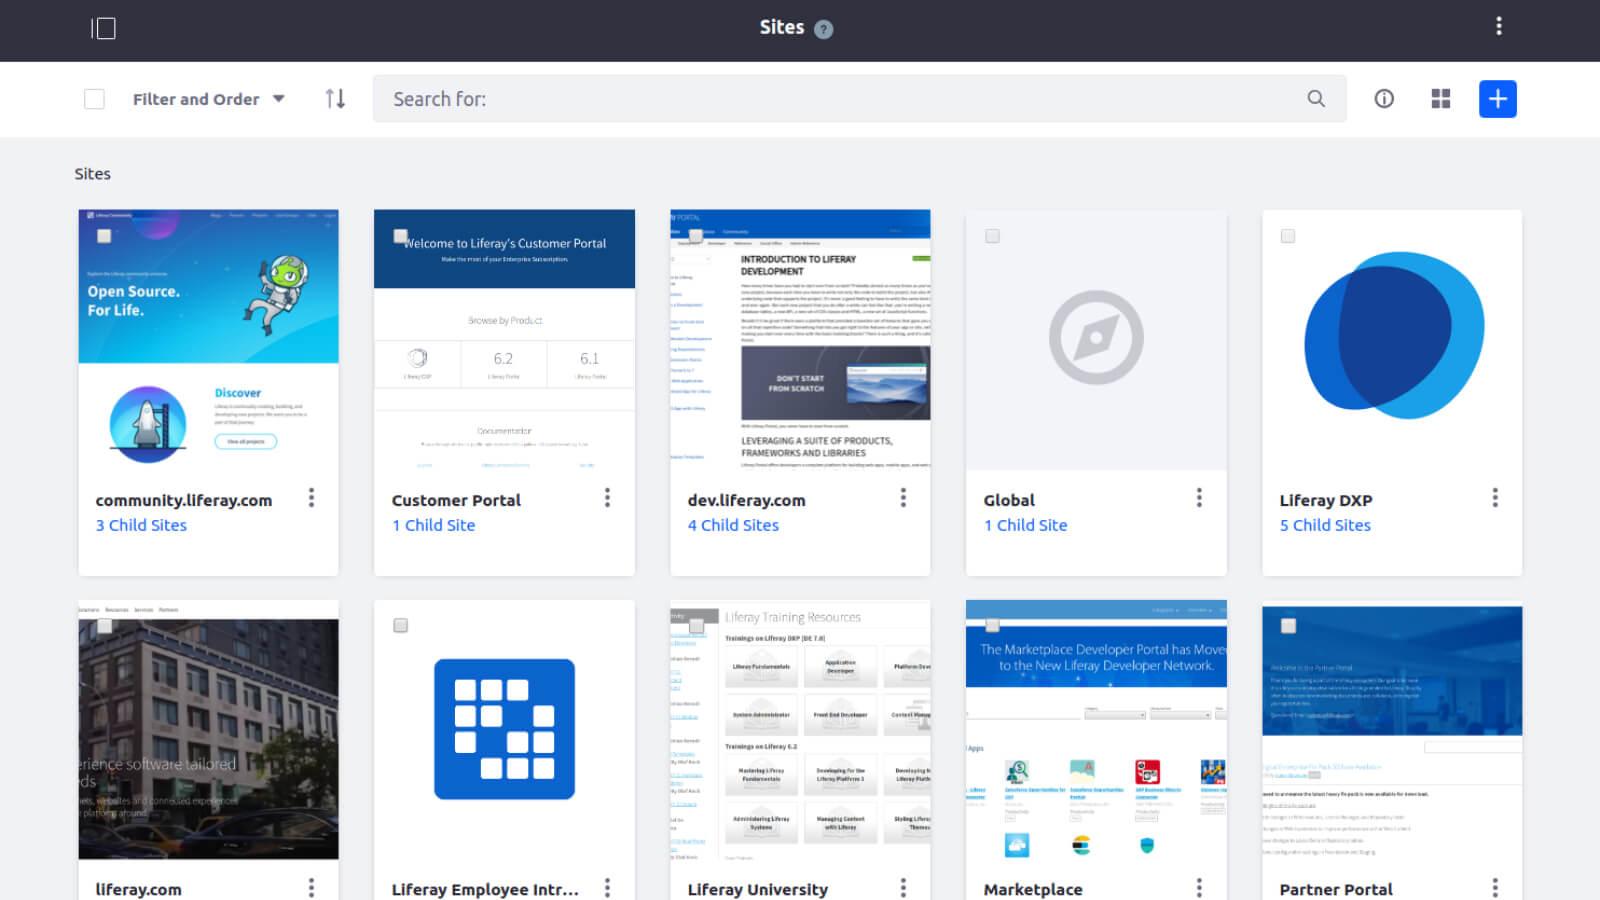 Liferay Digital Experience Platform Demo - Liferay DXP Site Administration